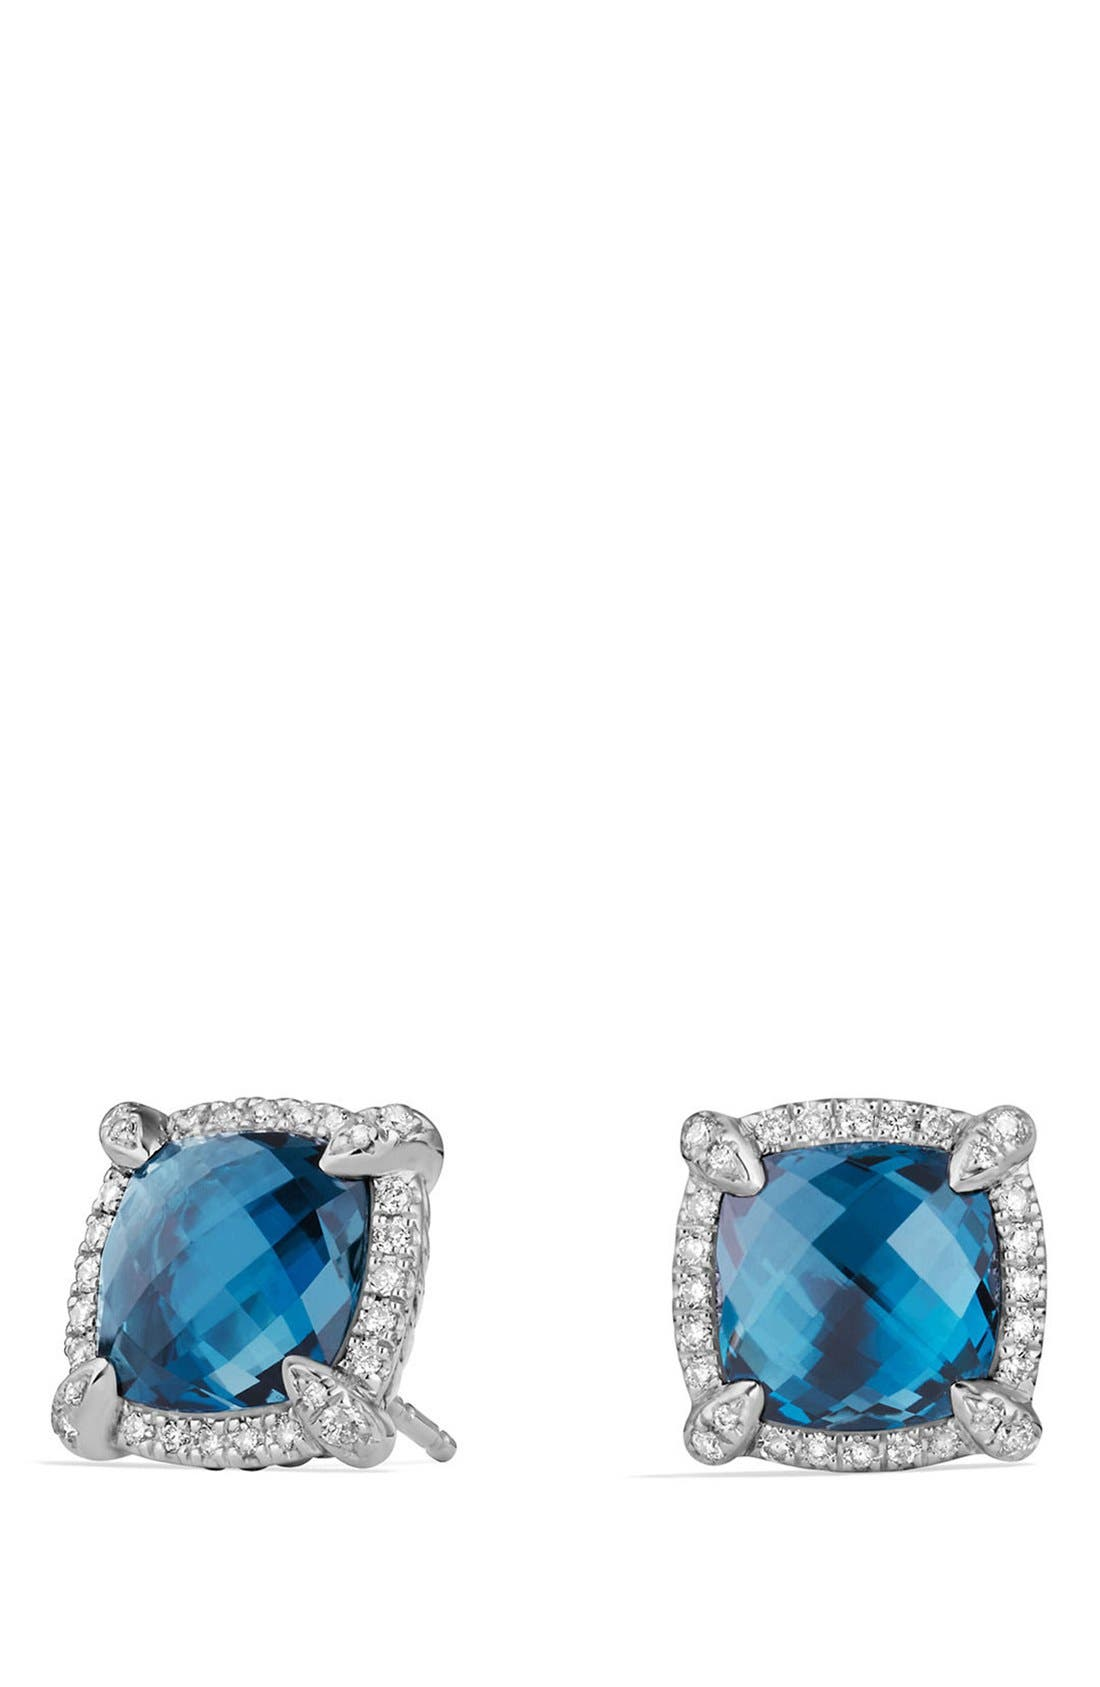 'Châtelaine' Pavé Bezel Stud Earrings with Diamonds,                             Main thumbnail 1, color,                             Blue Topaz